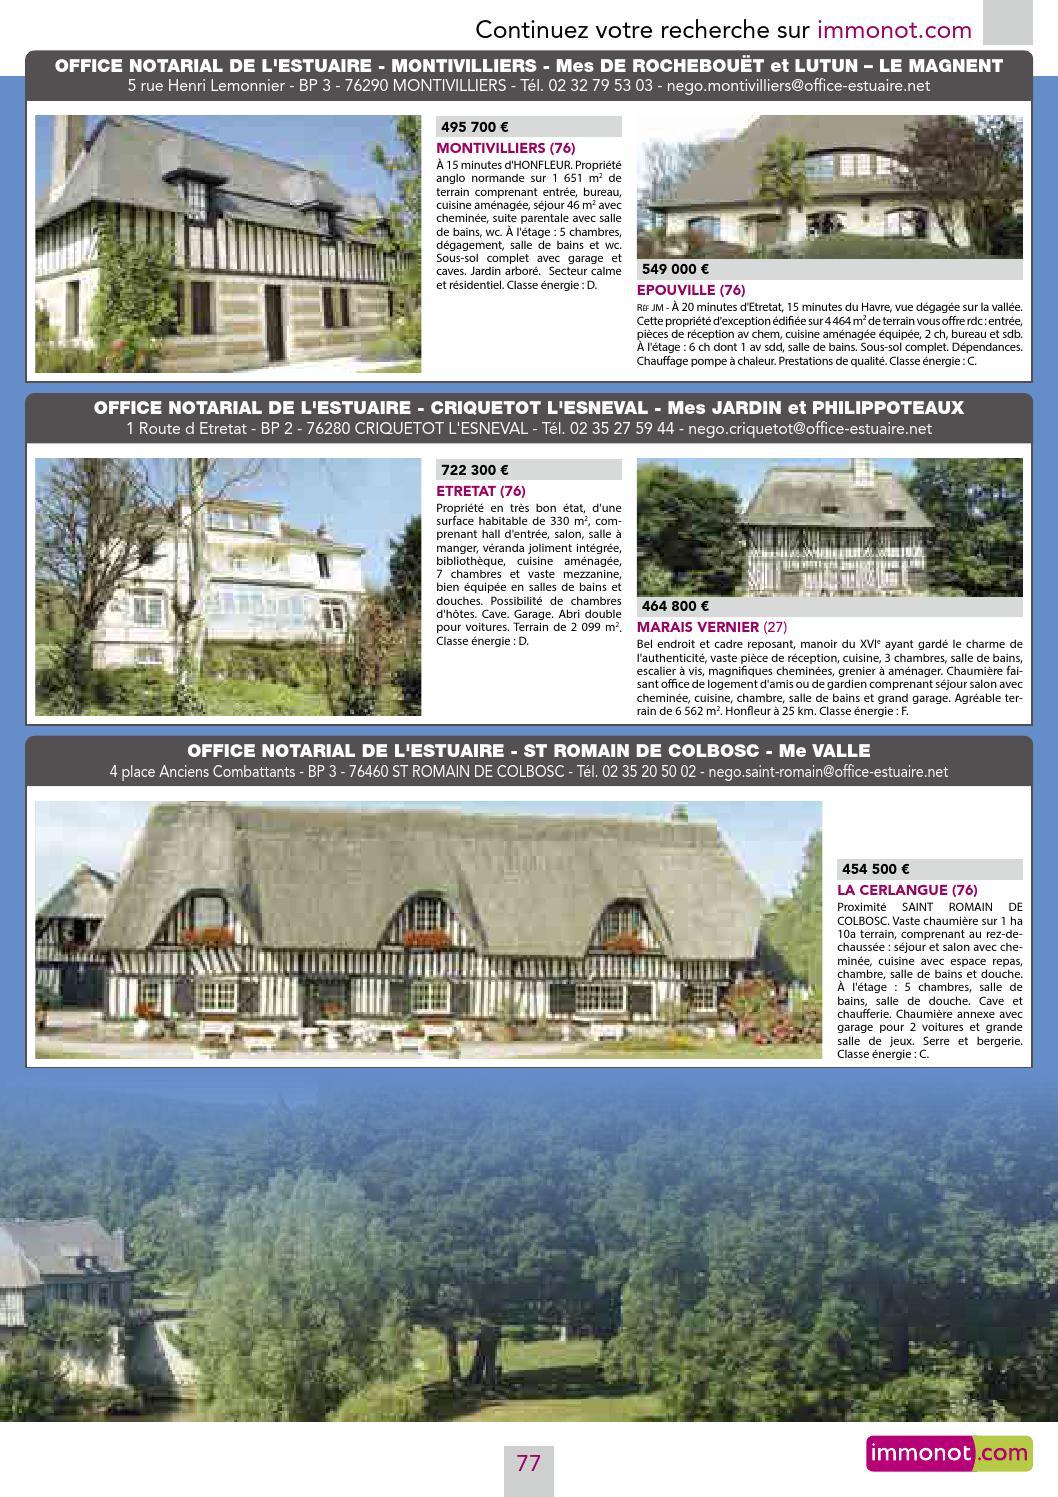 Magazine Immobilier Des Notaires By Nicolas Dubernard Issuu